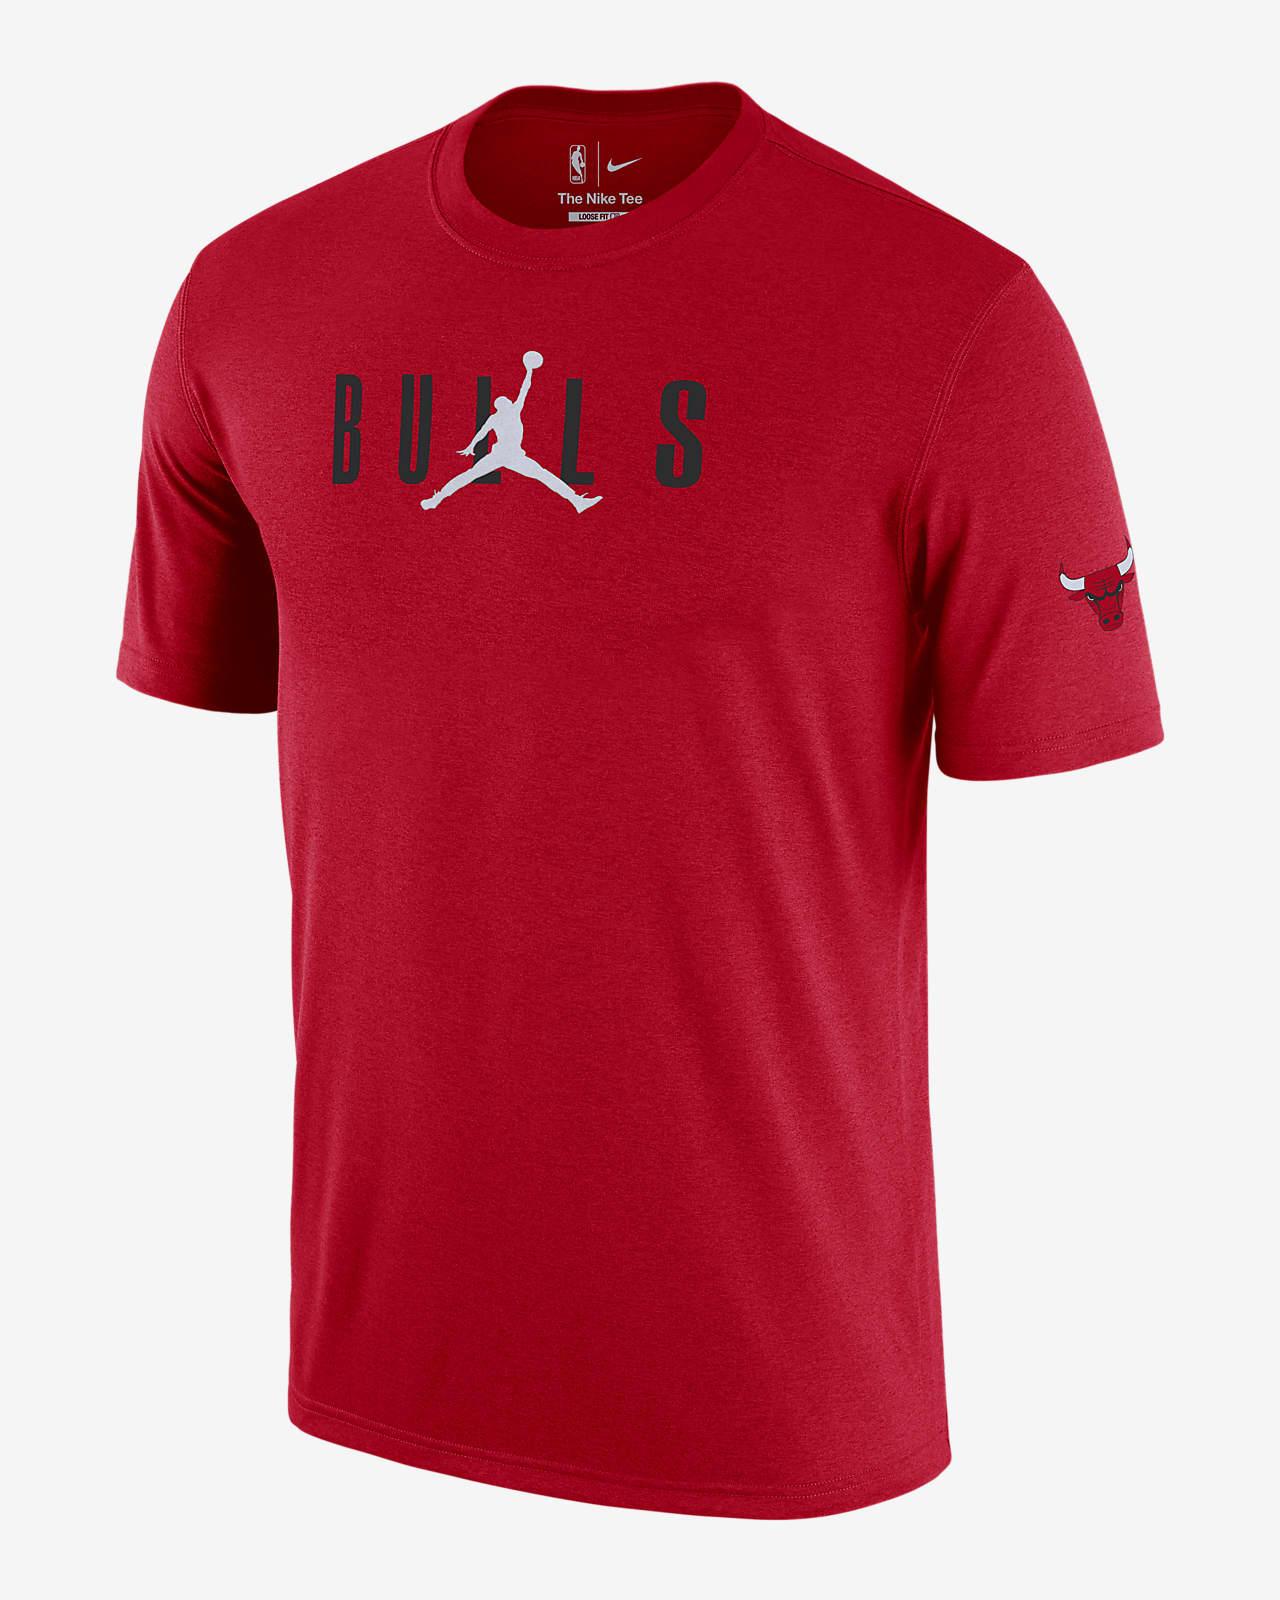 Chicago Bulls Courtside Men's Jordan NBA T-Shirt